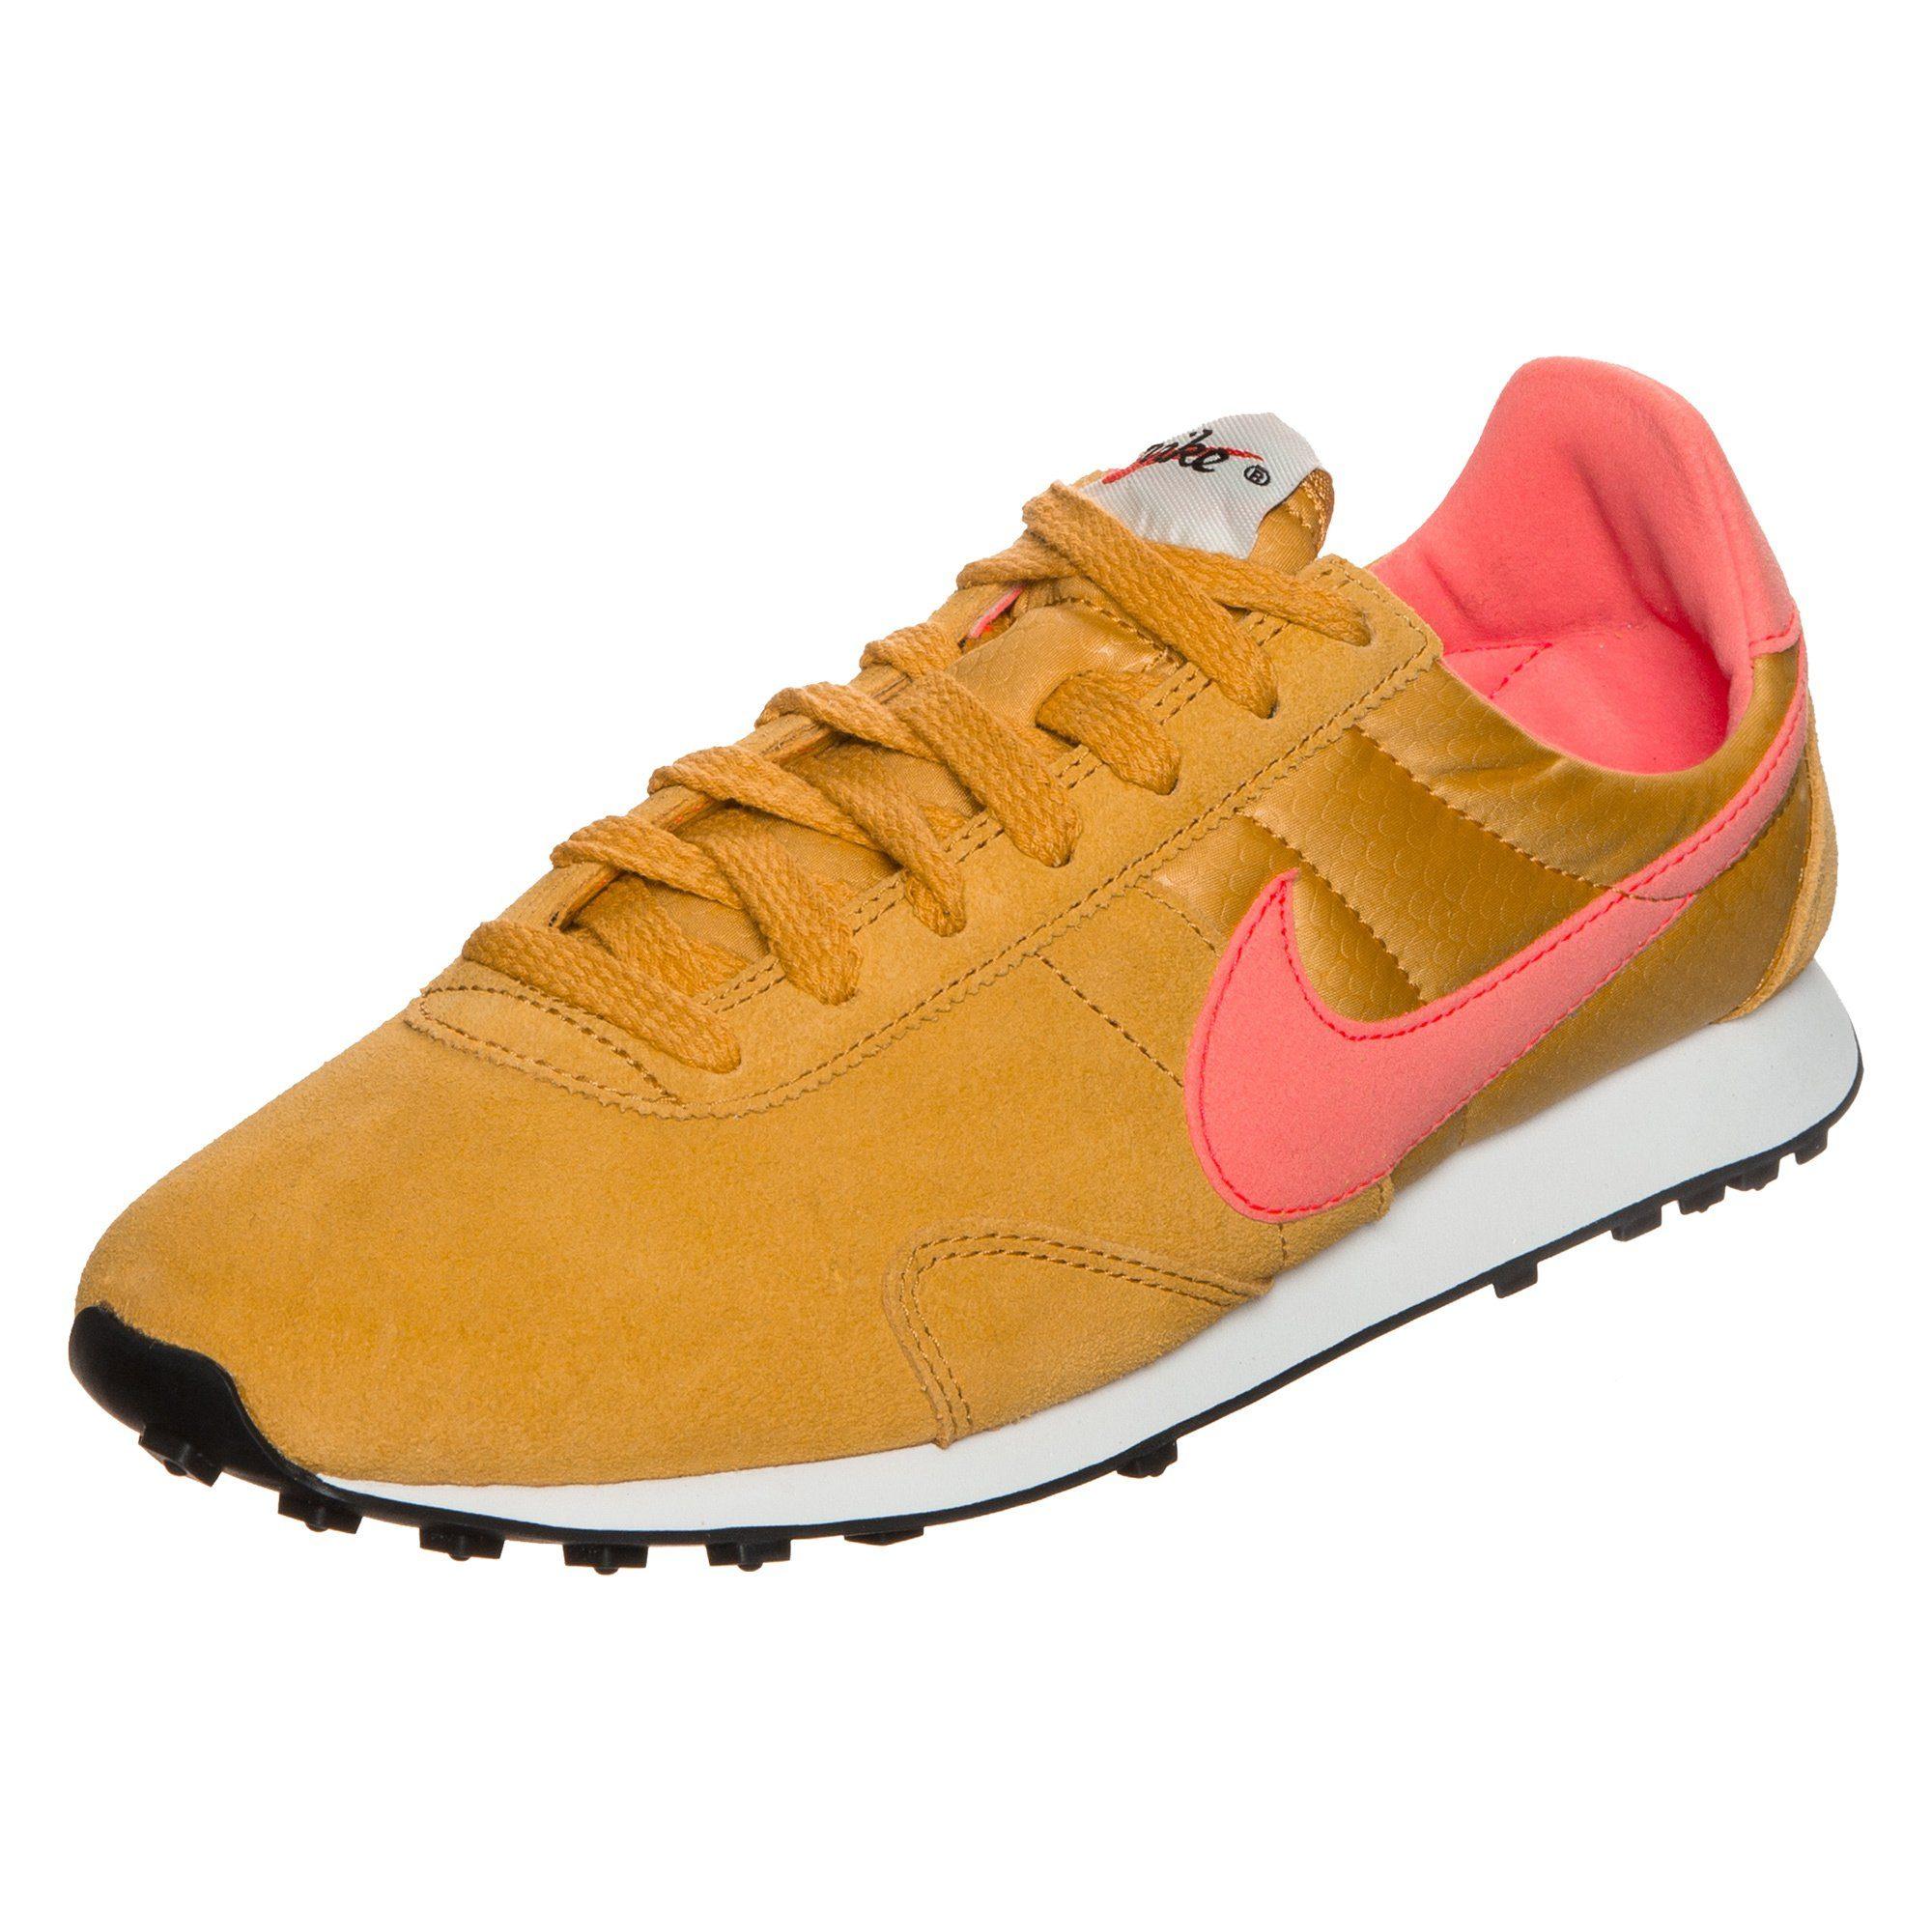 Nike Sportswear Pre Montreal Racer Vintage Sneaker online kaufen  gelb-orange